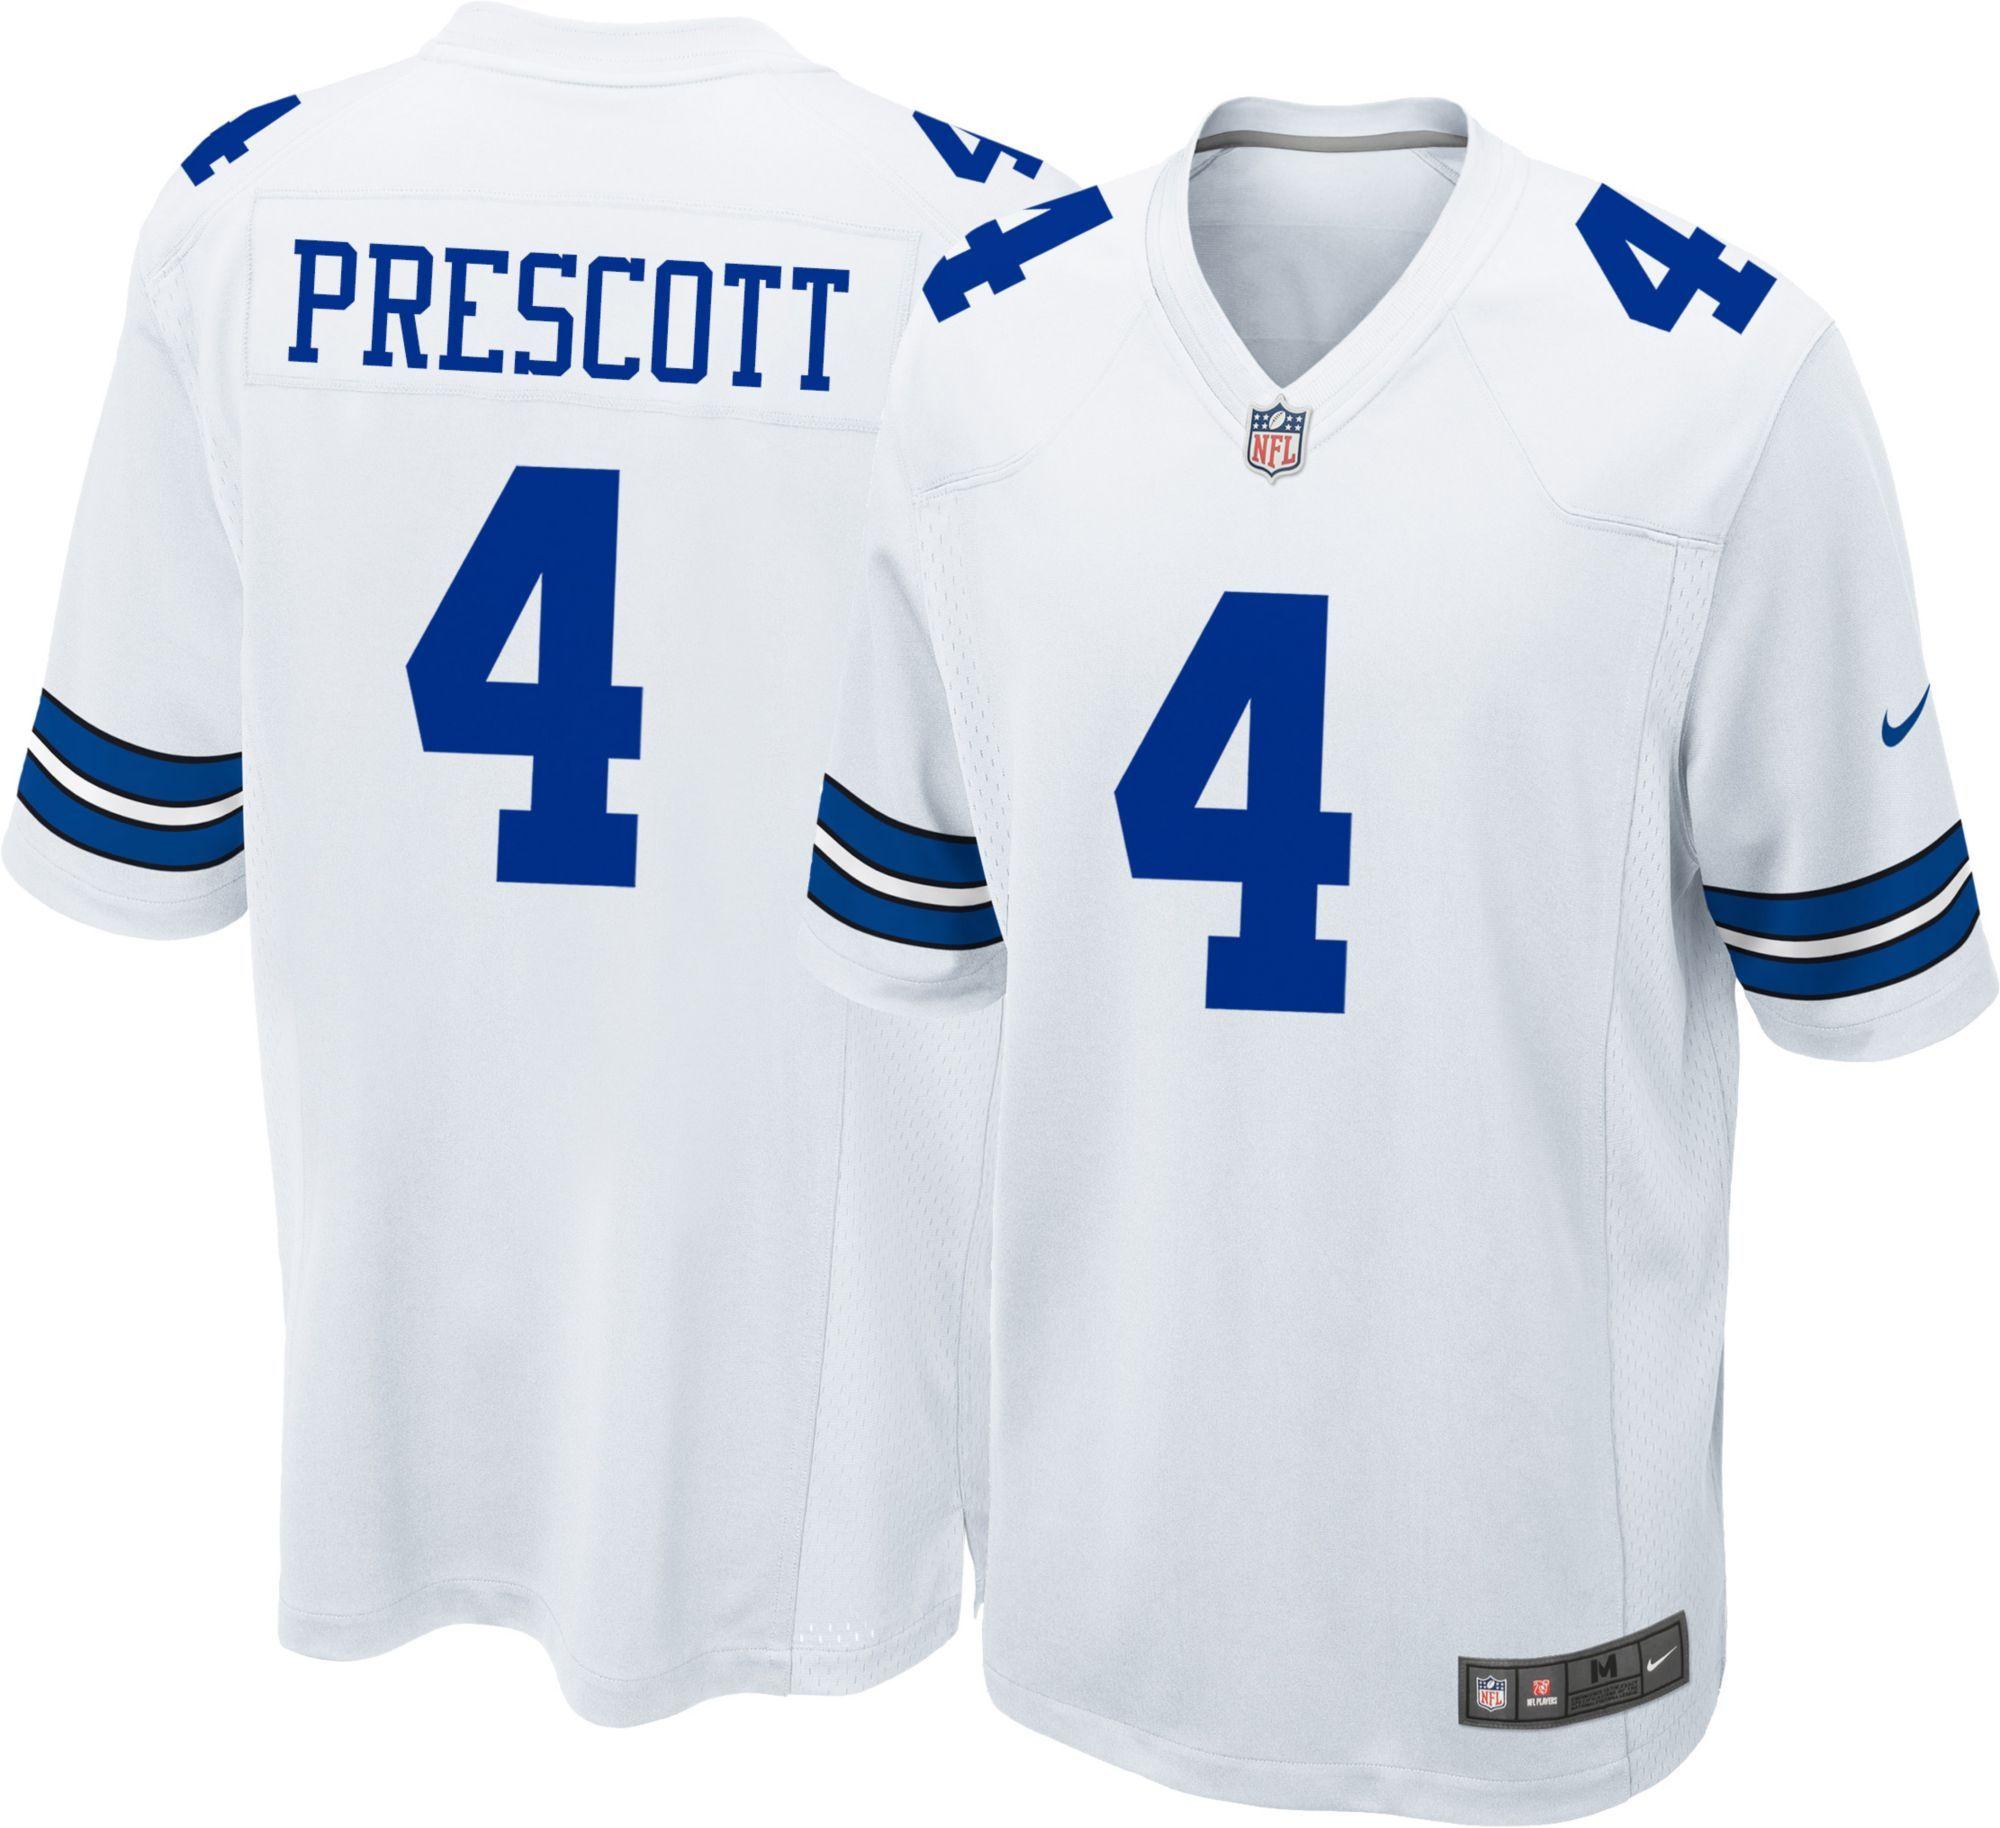 8eac7c16c Nike Men s Game Jersey Dallas Cowboys Dak Prescott  4 in 2019 ...